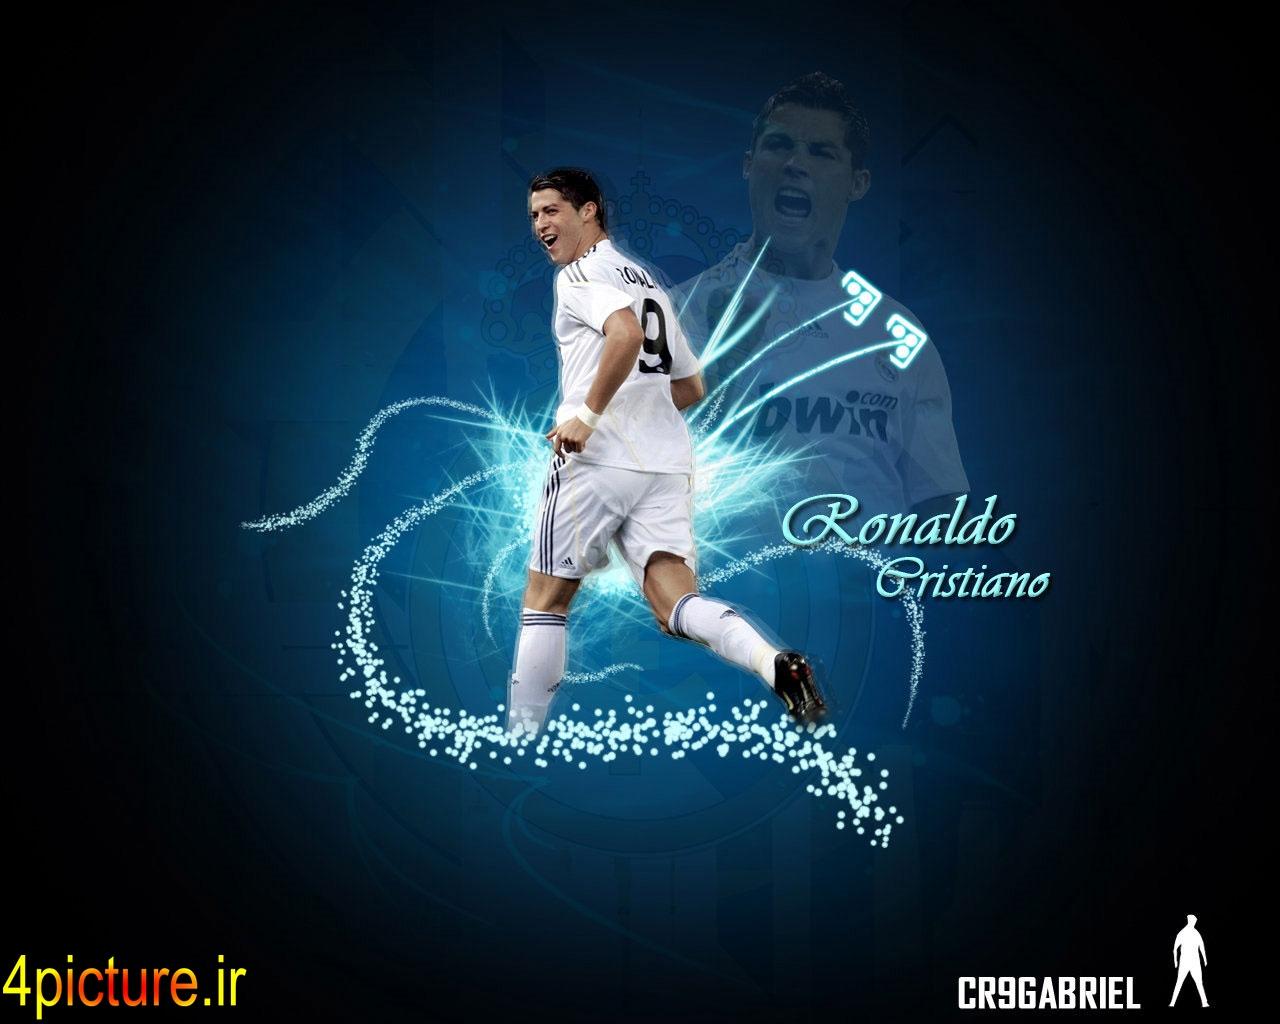 Cristiano Ronaldo,کریستین رونالدو,ronaldo,رونالدو,عکس رونالدو,ronaldo wallpaper